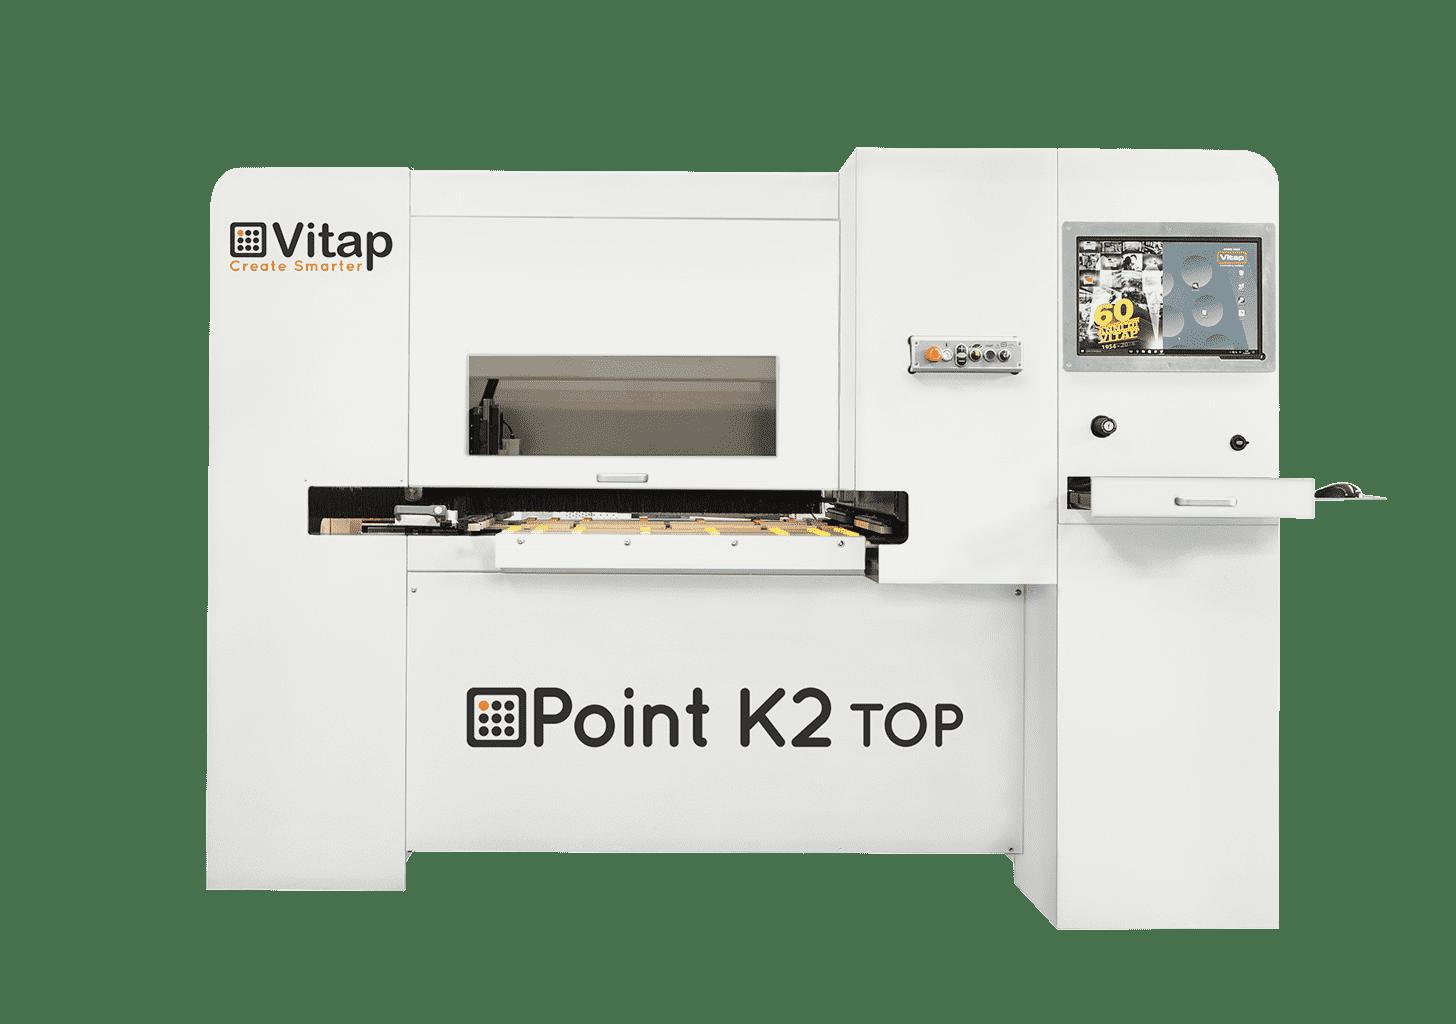 Vitap - Point K2 Top